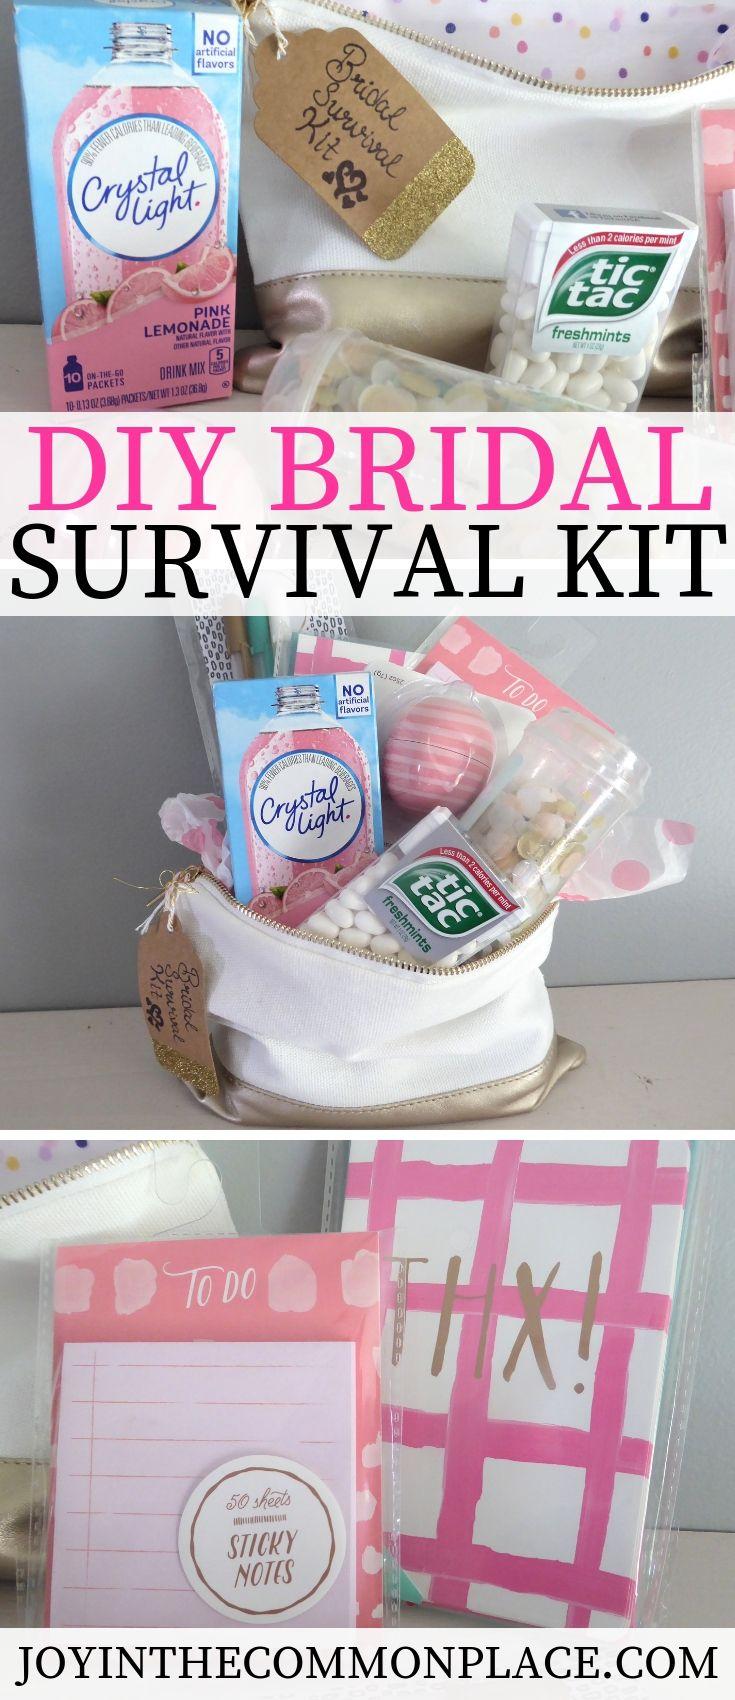 How To Arrange A Bridal Survival Kit Bridal Survival Kit Diy Bridal Shower Gifts Bridal Shower Gifts For Bride